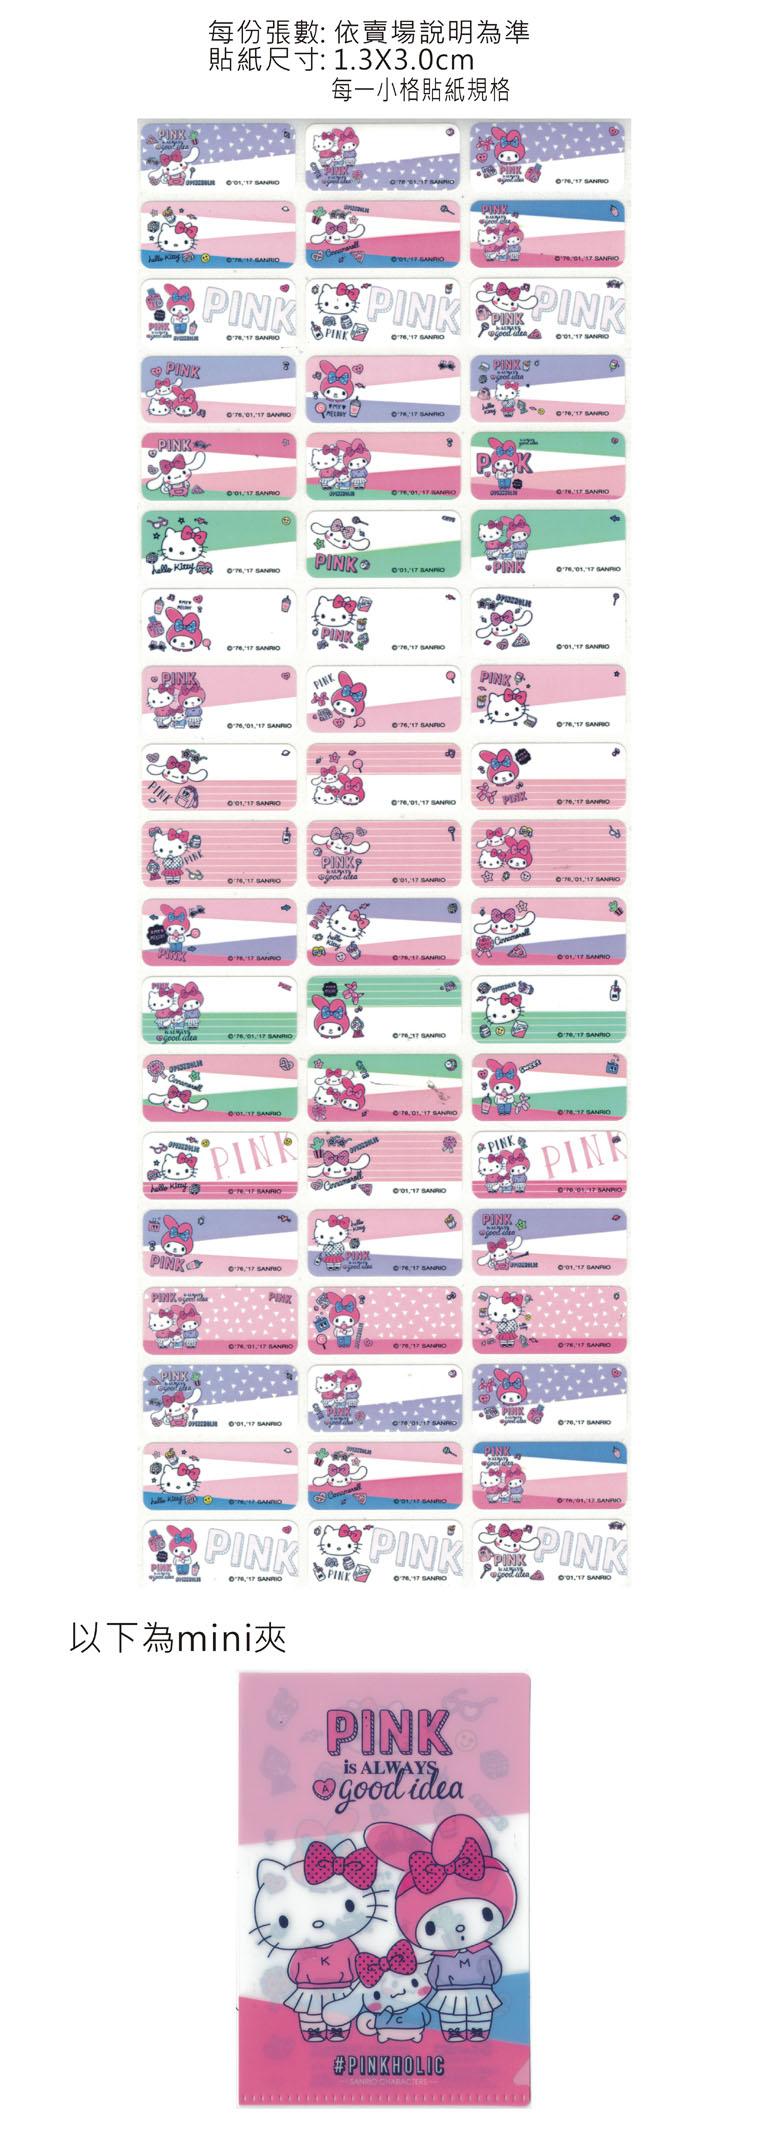 CQ款PINK三麗鷗授權-中型款姓名貼